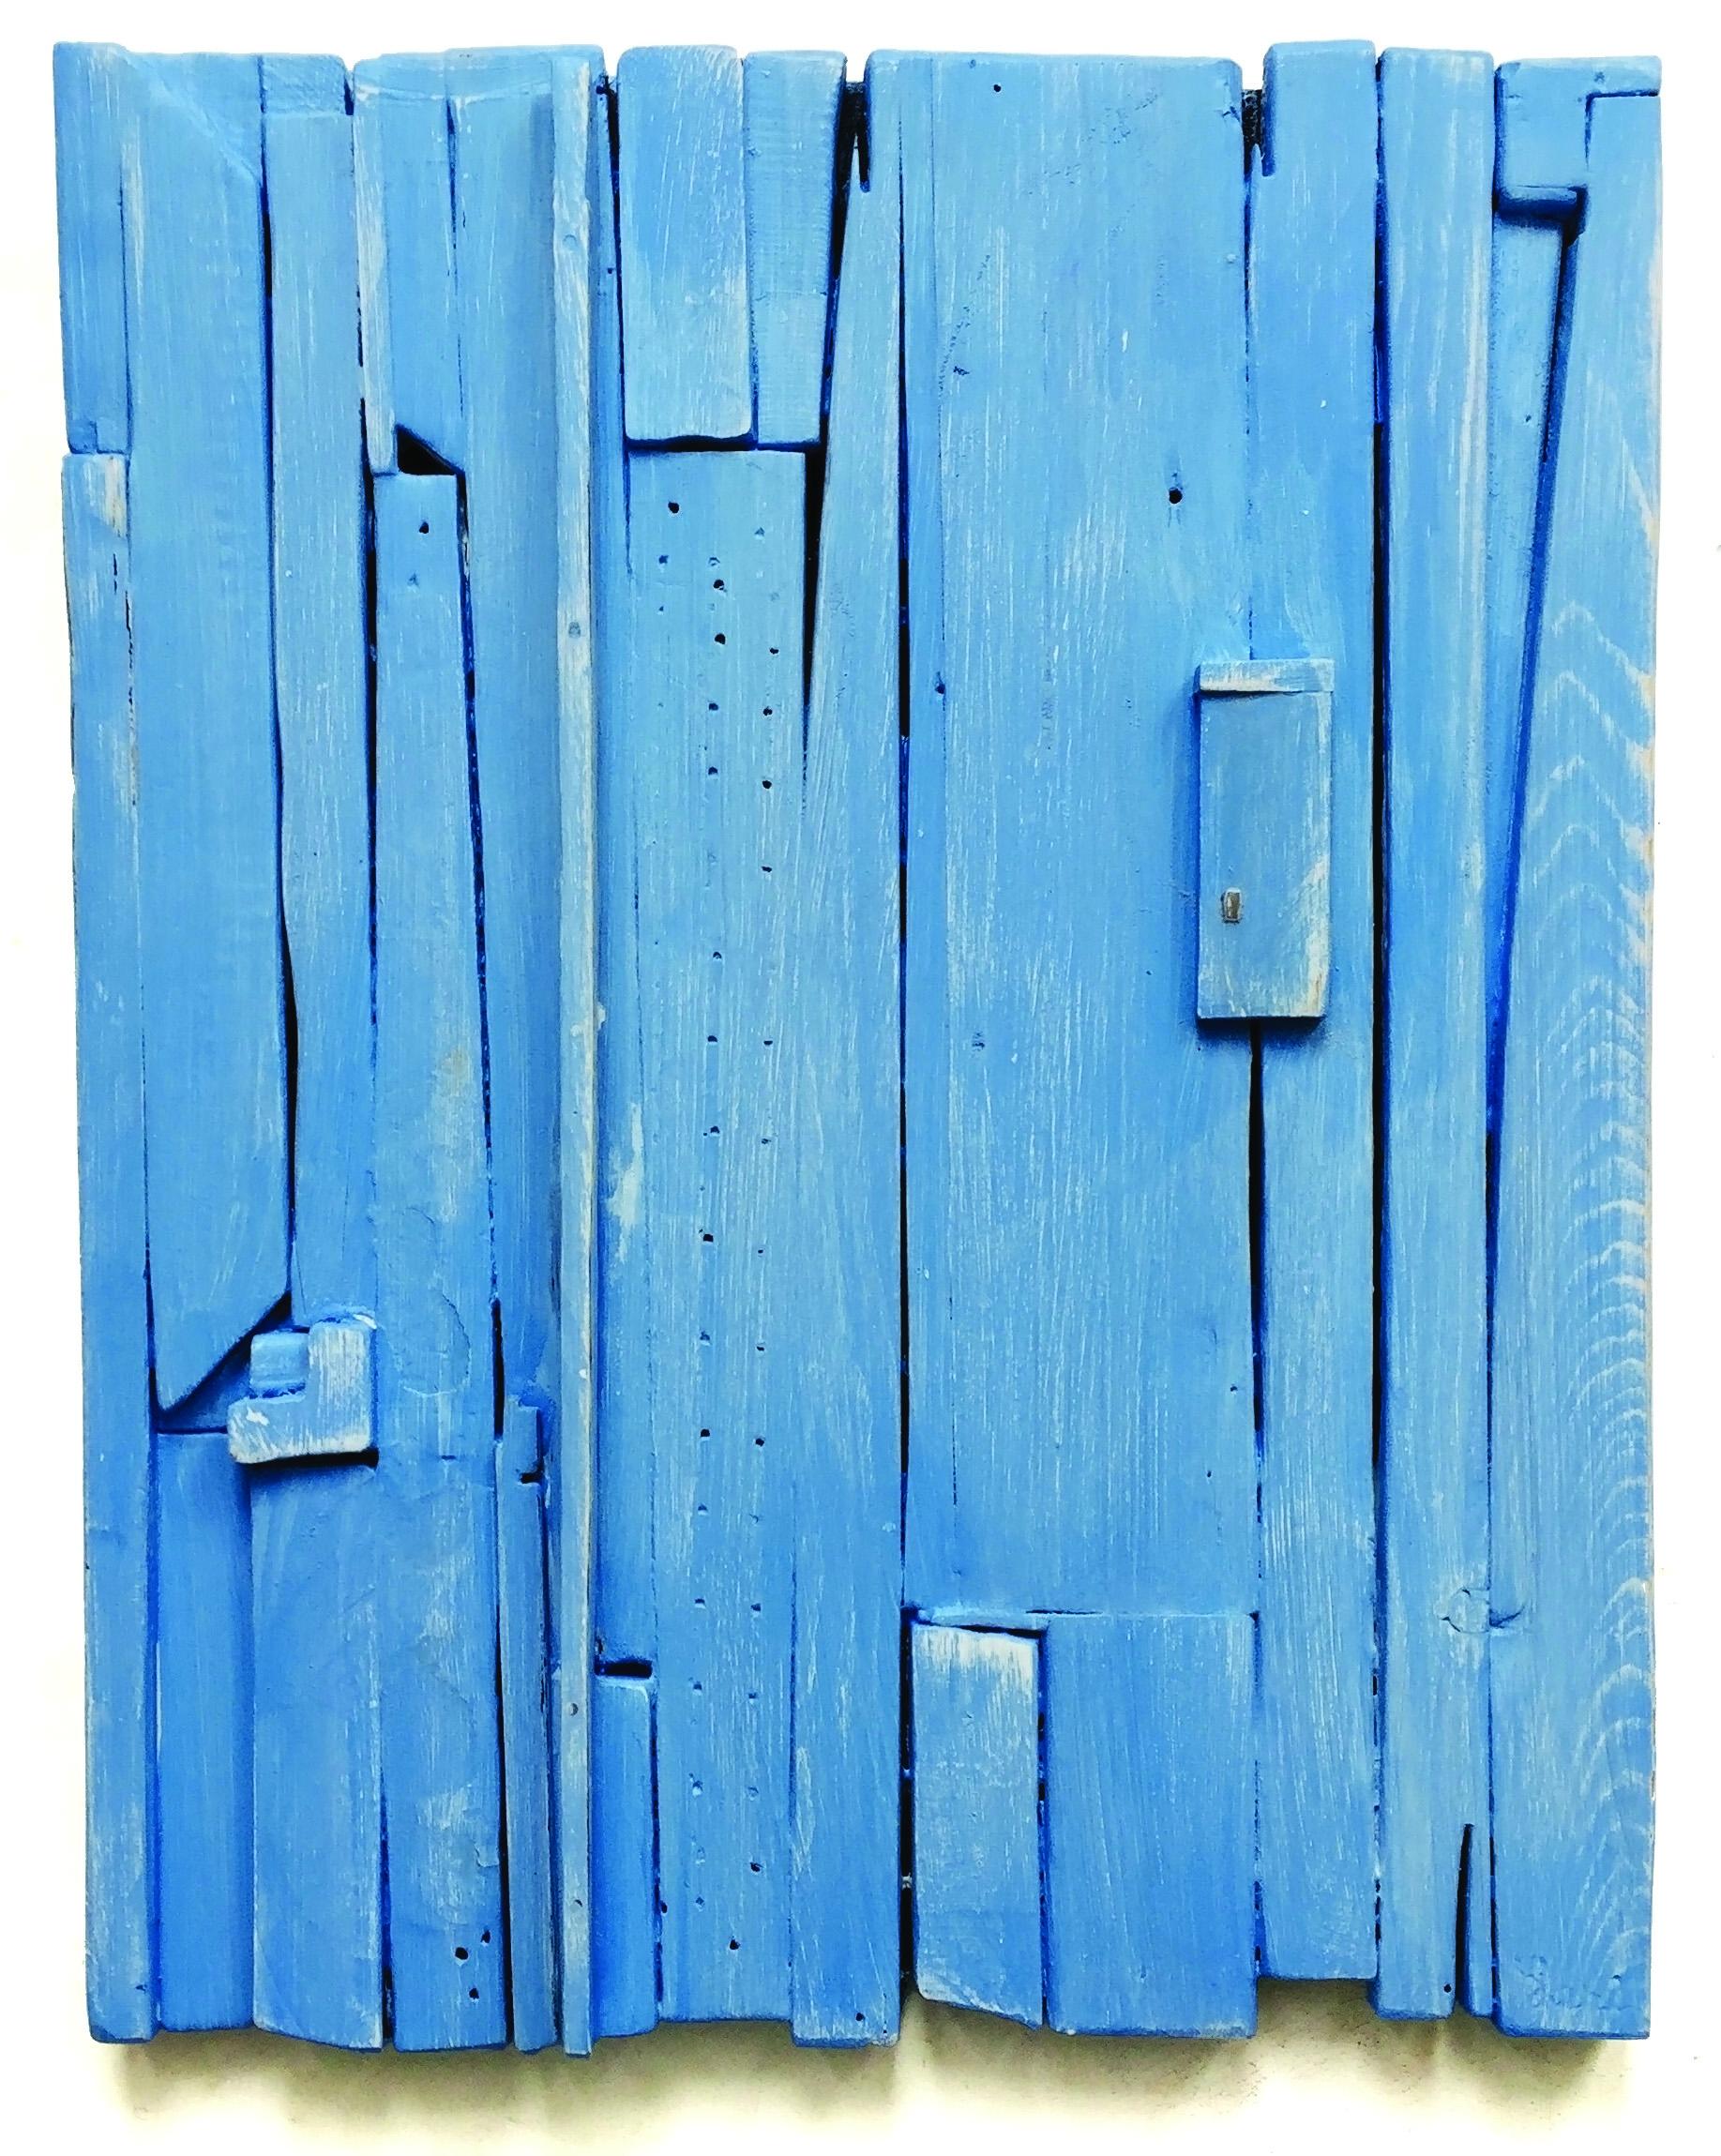 Painted Wood Light Blue